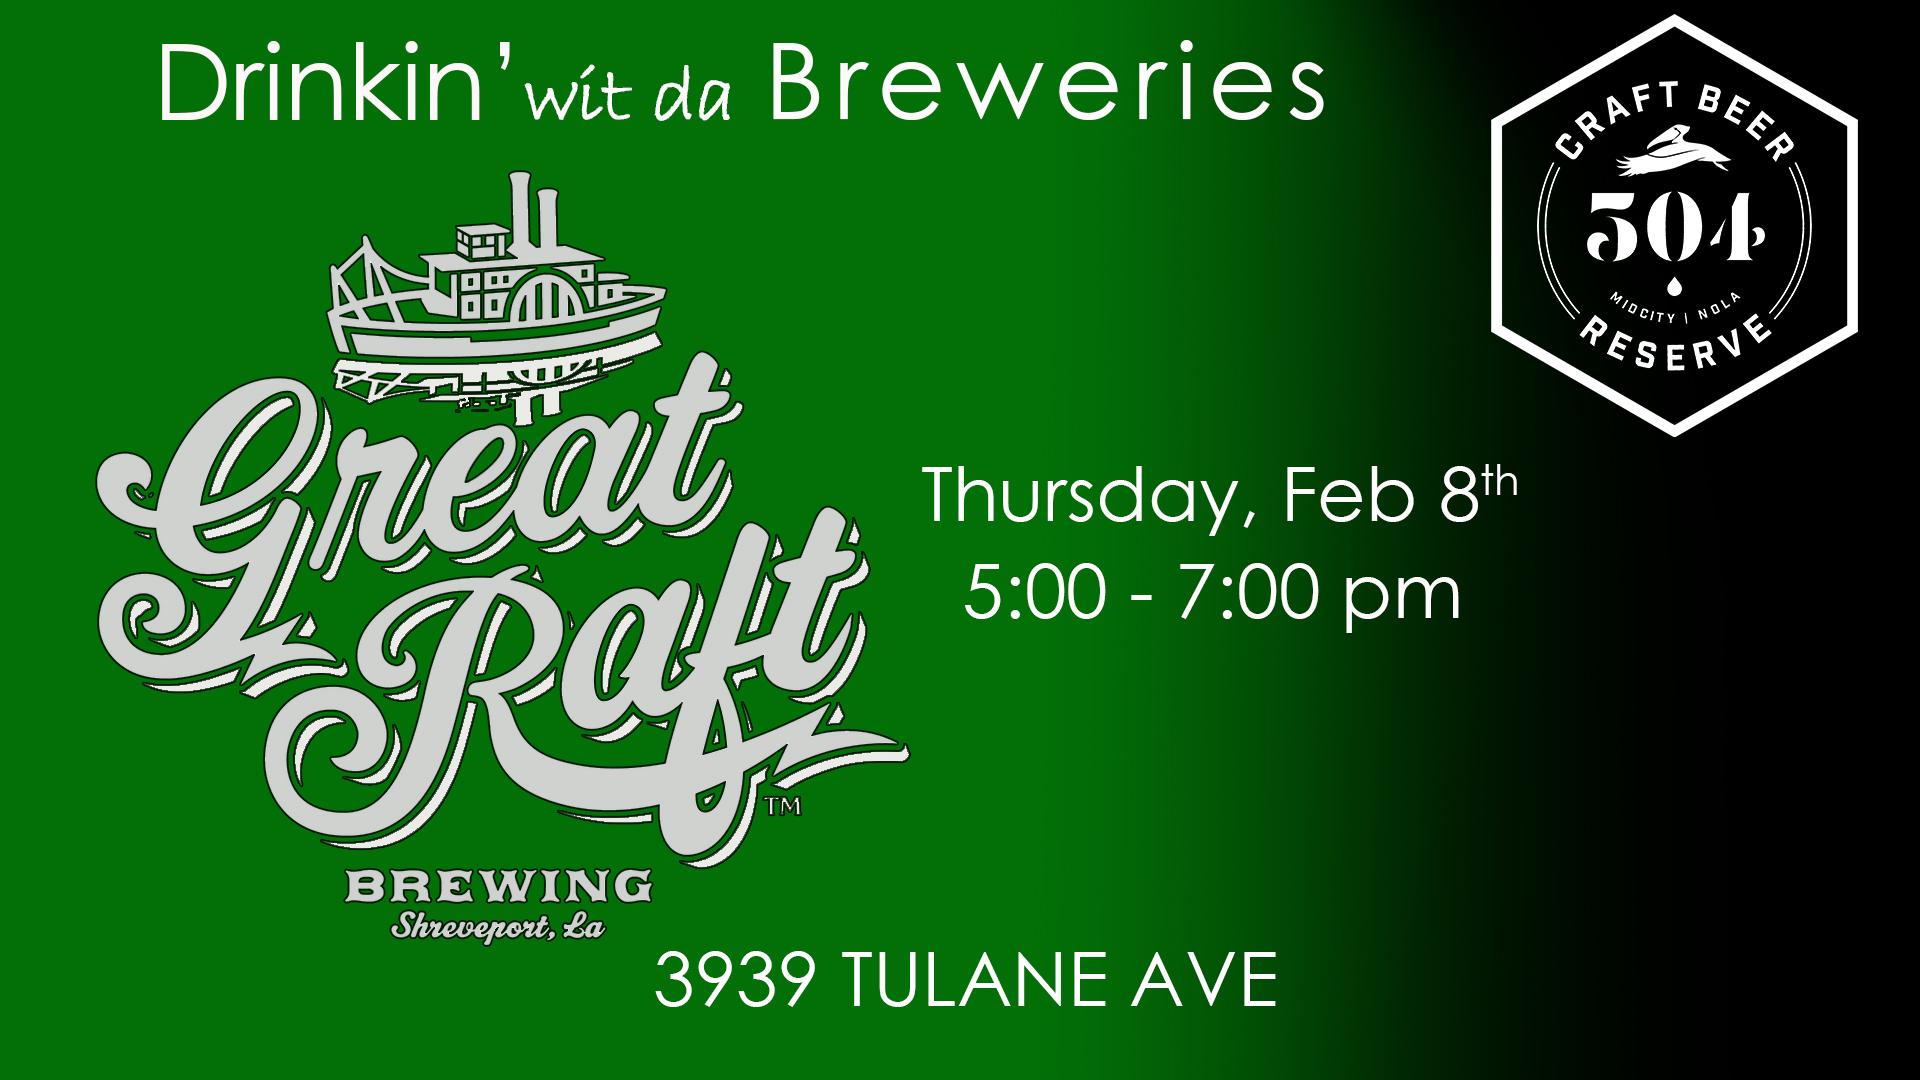 Great Raft Drinkin wit Breweries.jpg